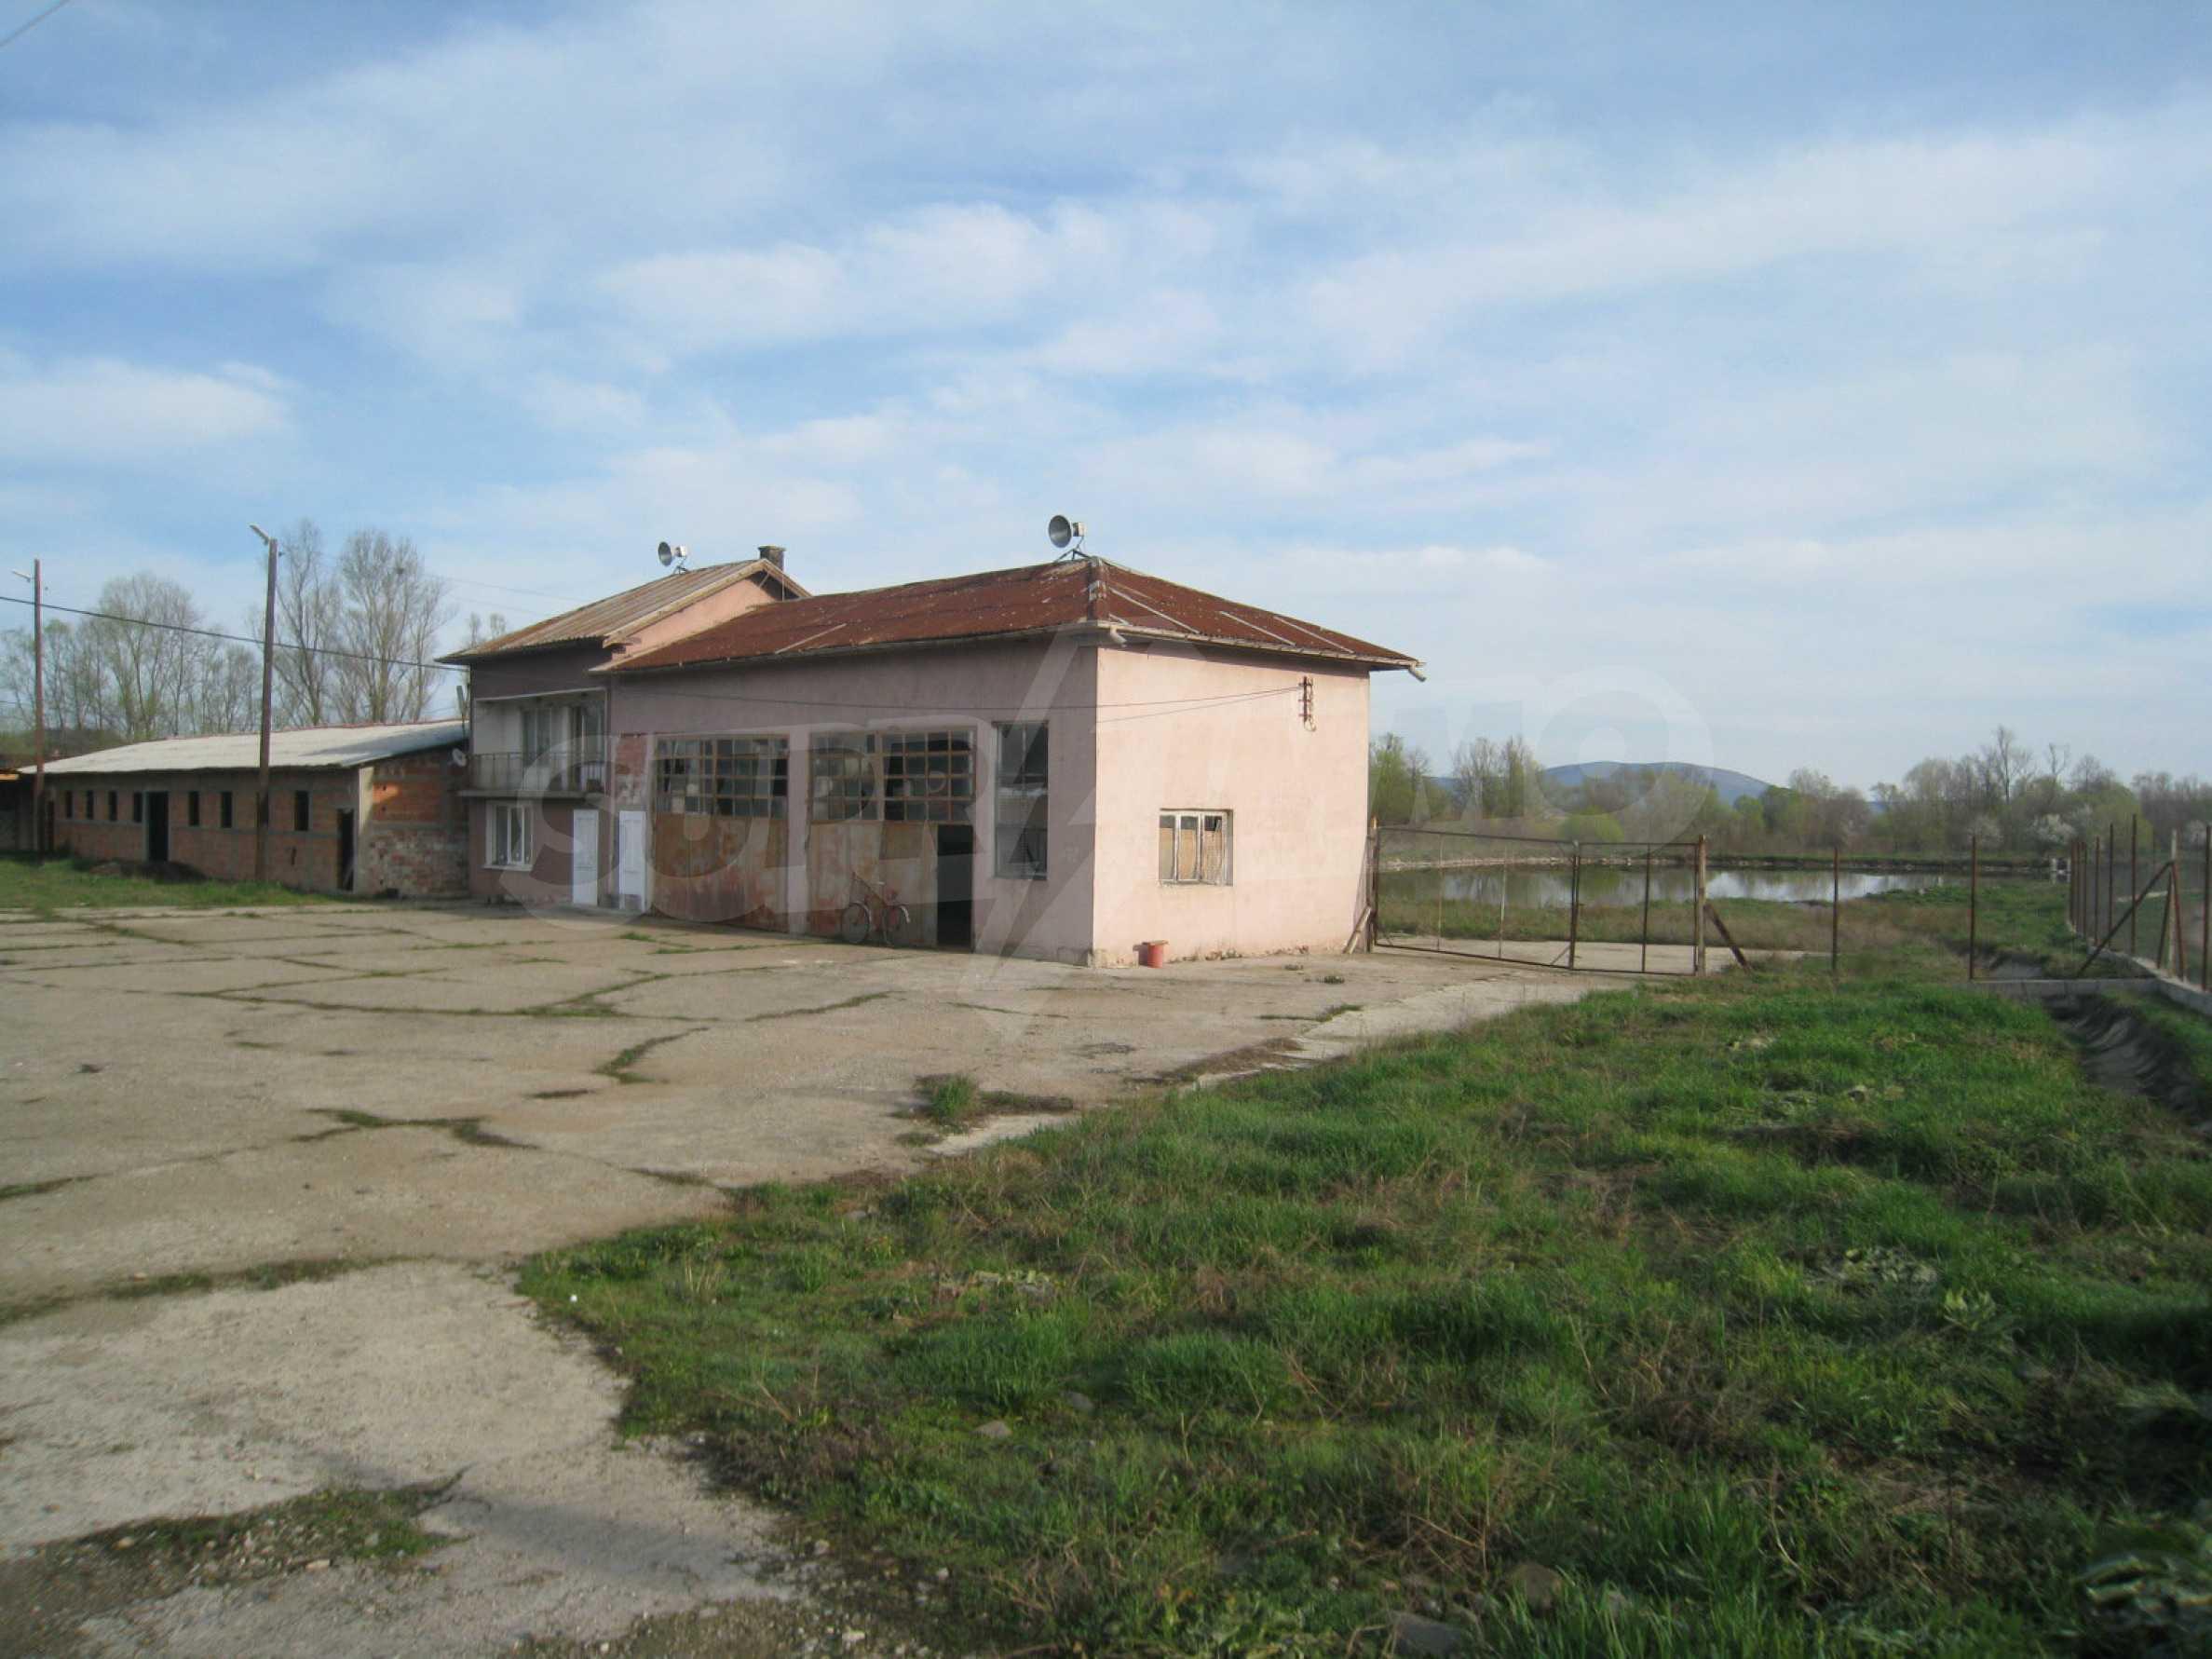 Fishpond, warehouses, residential areas and asphalt ground near Montana 17